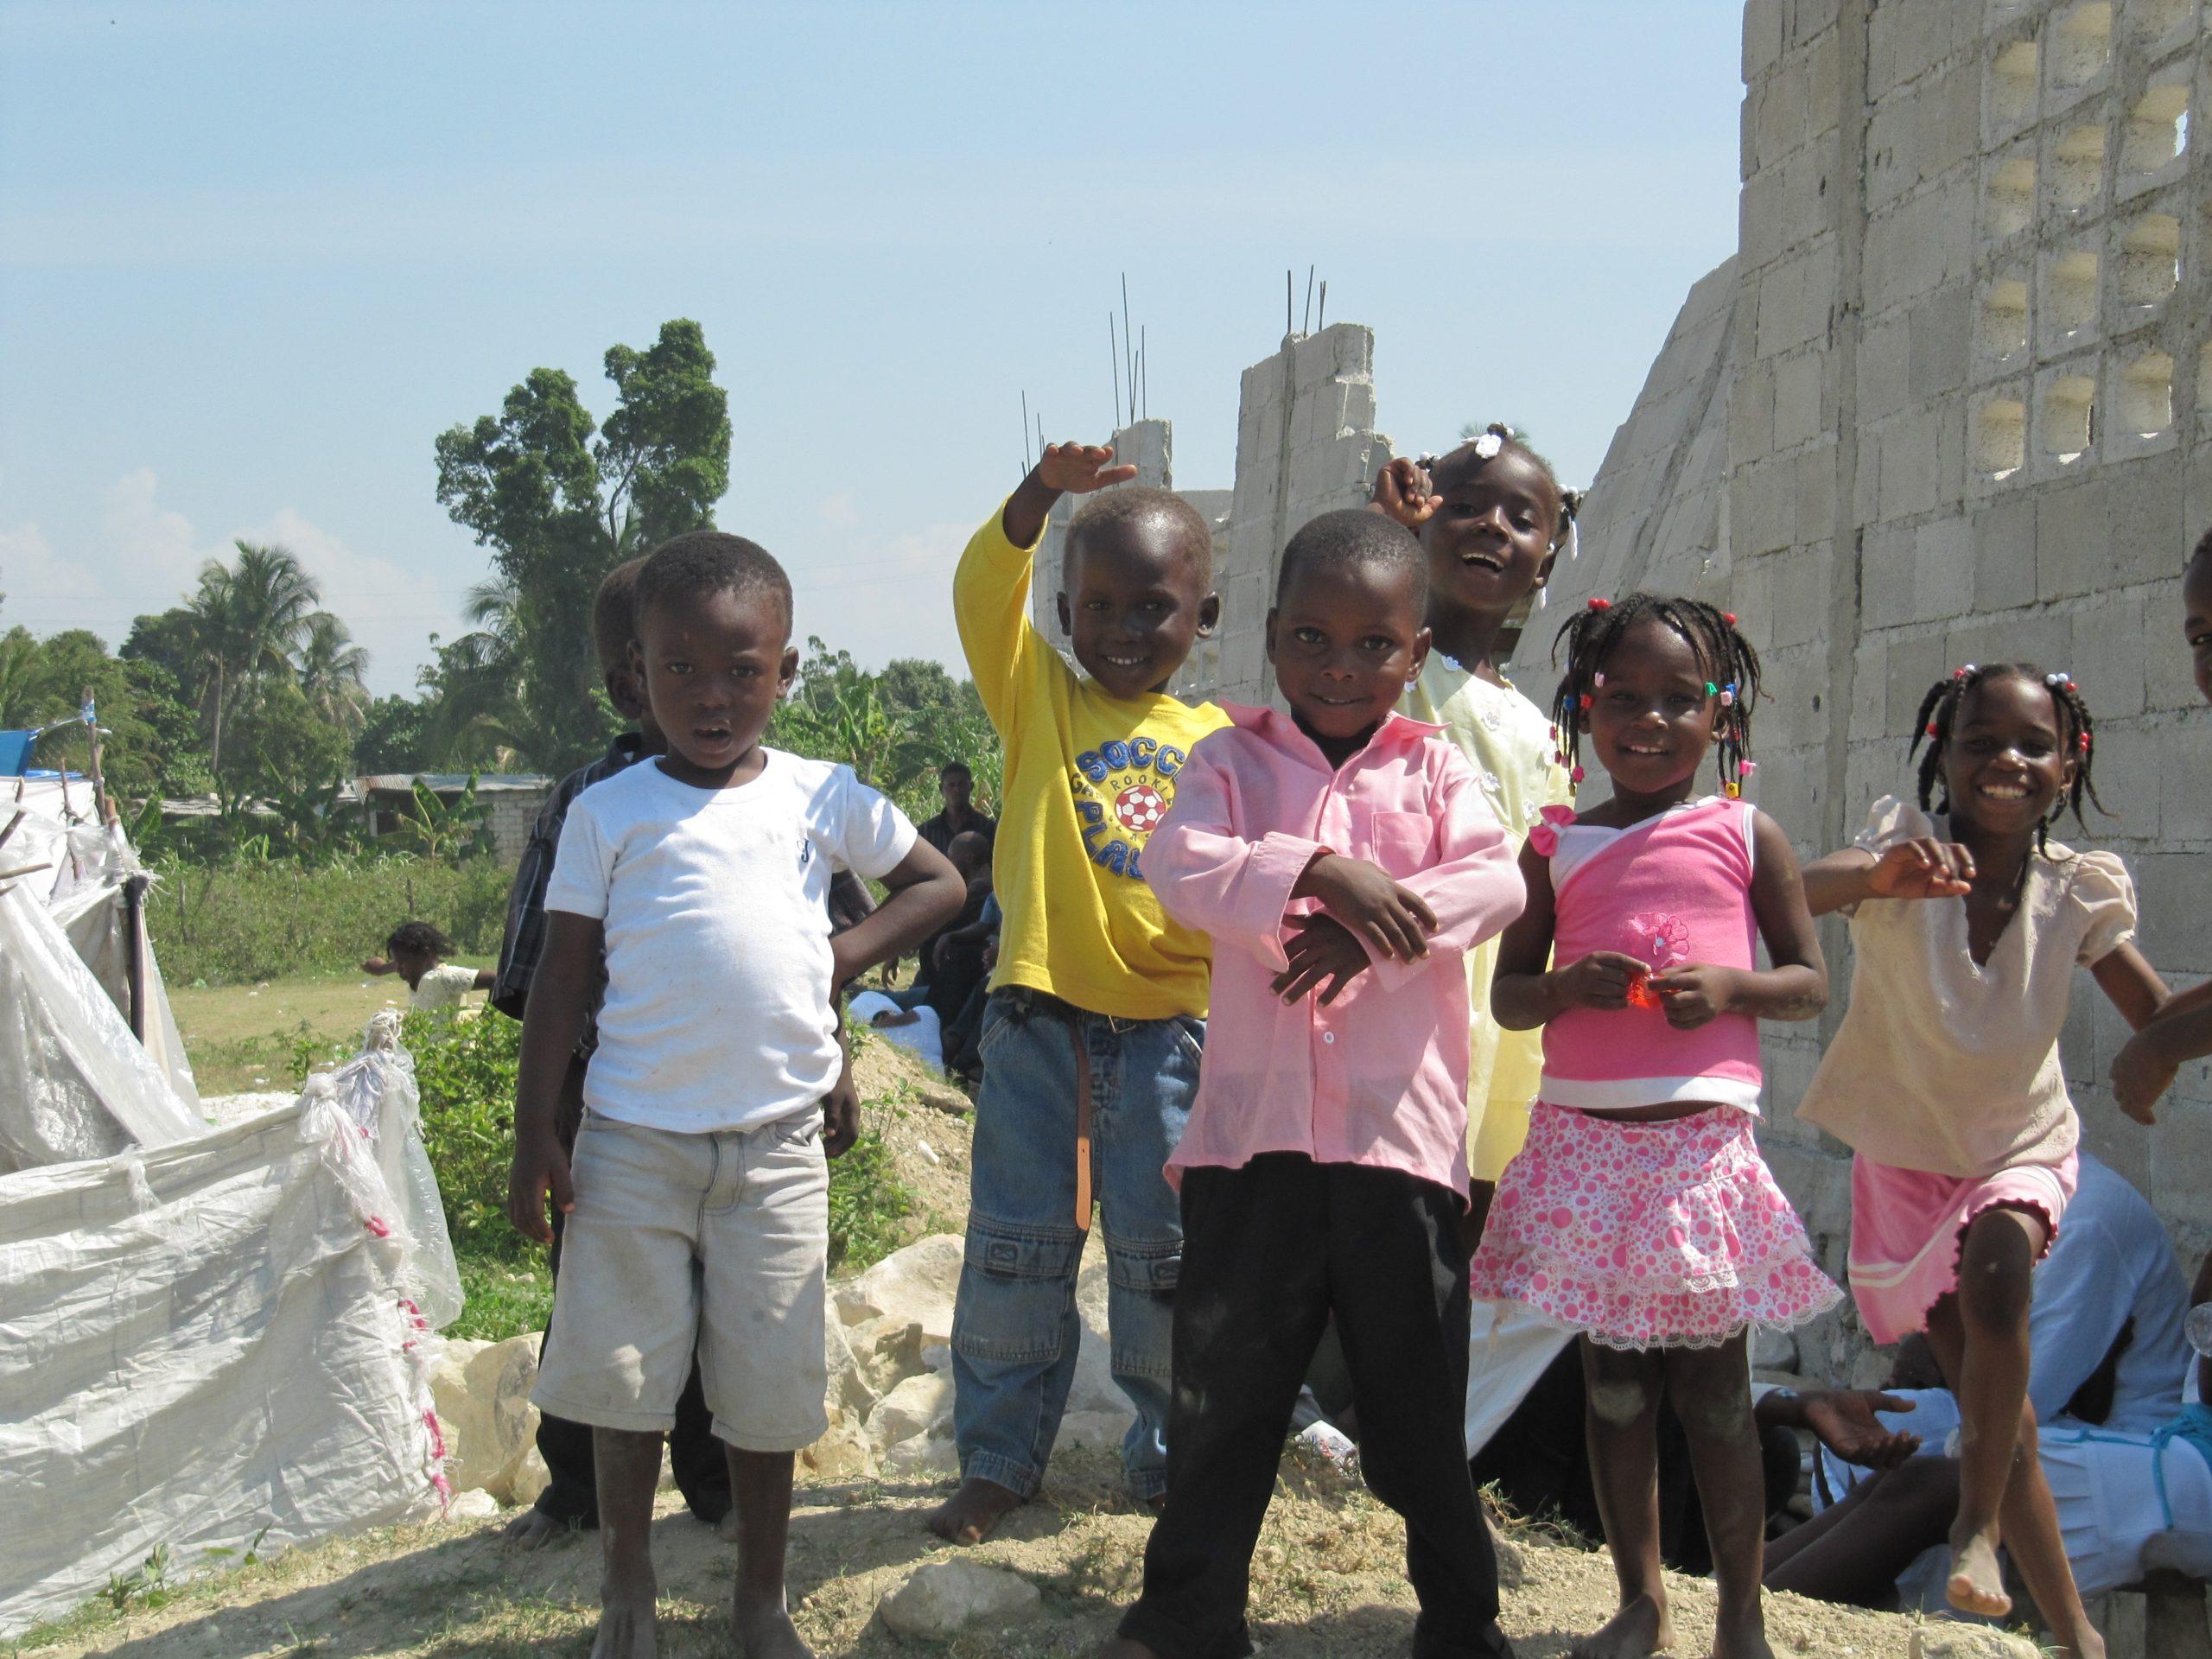 001_FRONT_COVER_Haiti_Felix_Ortiz.JPG